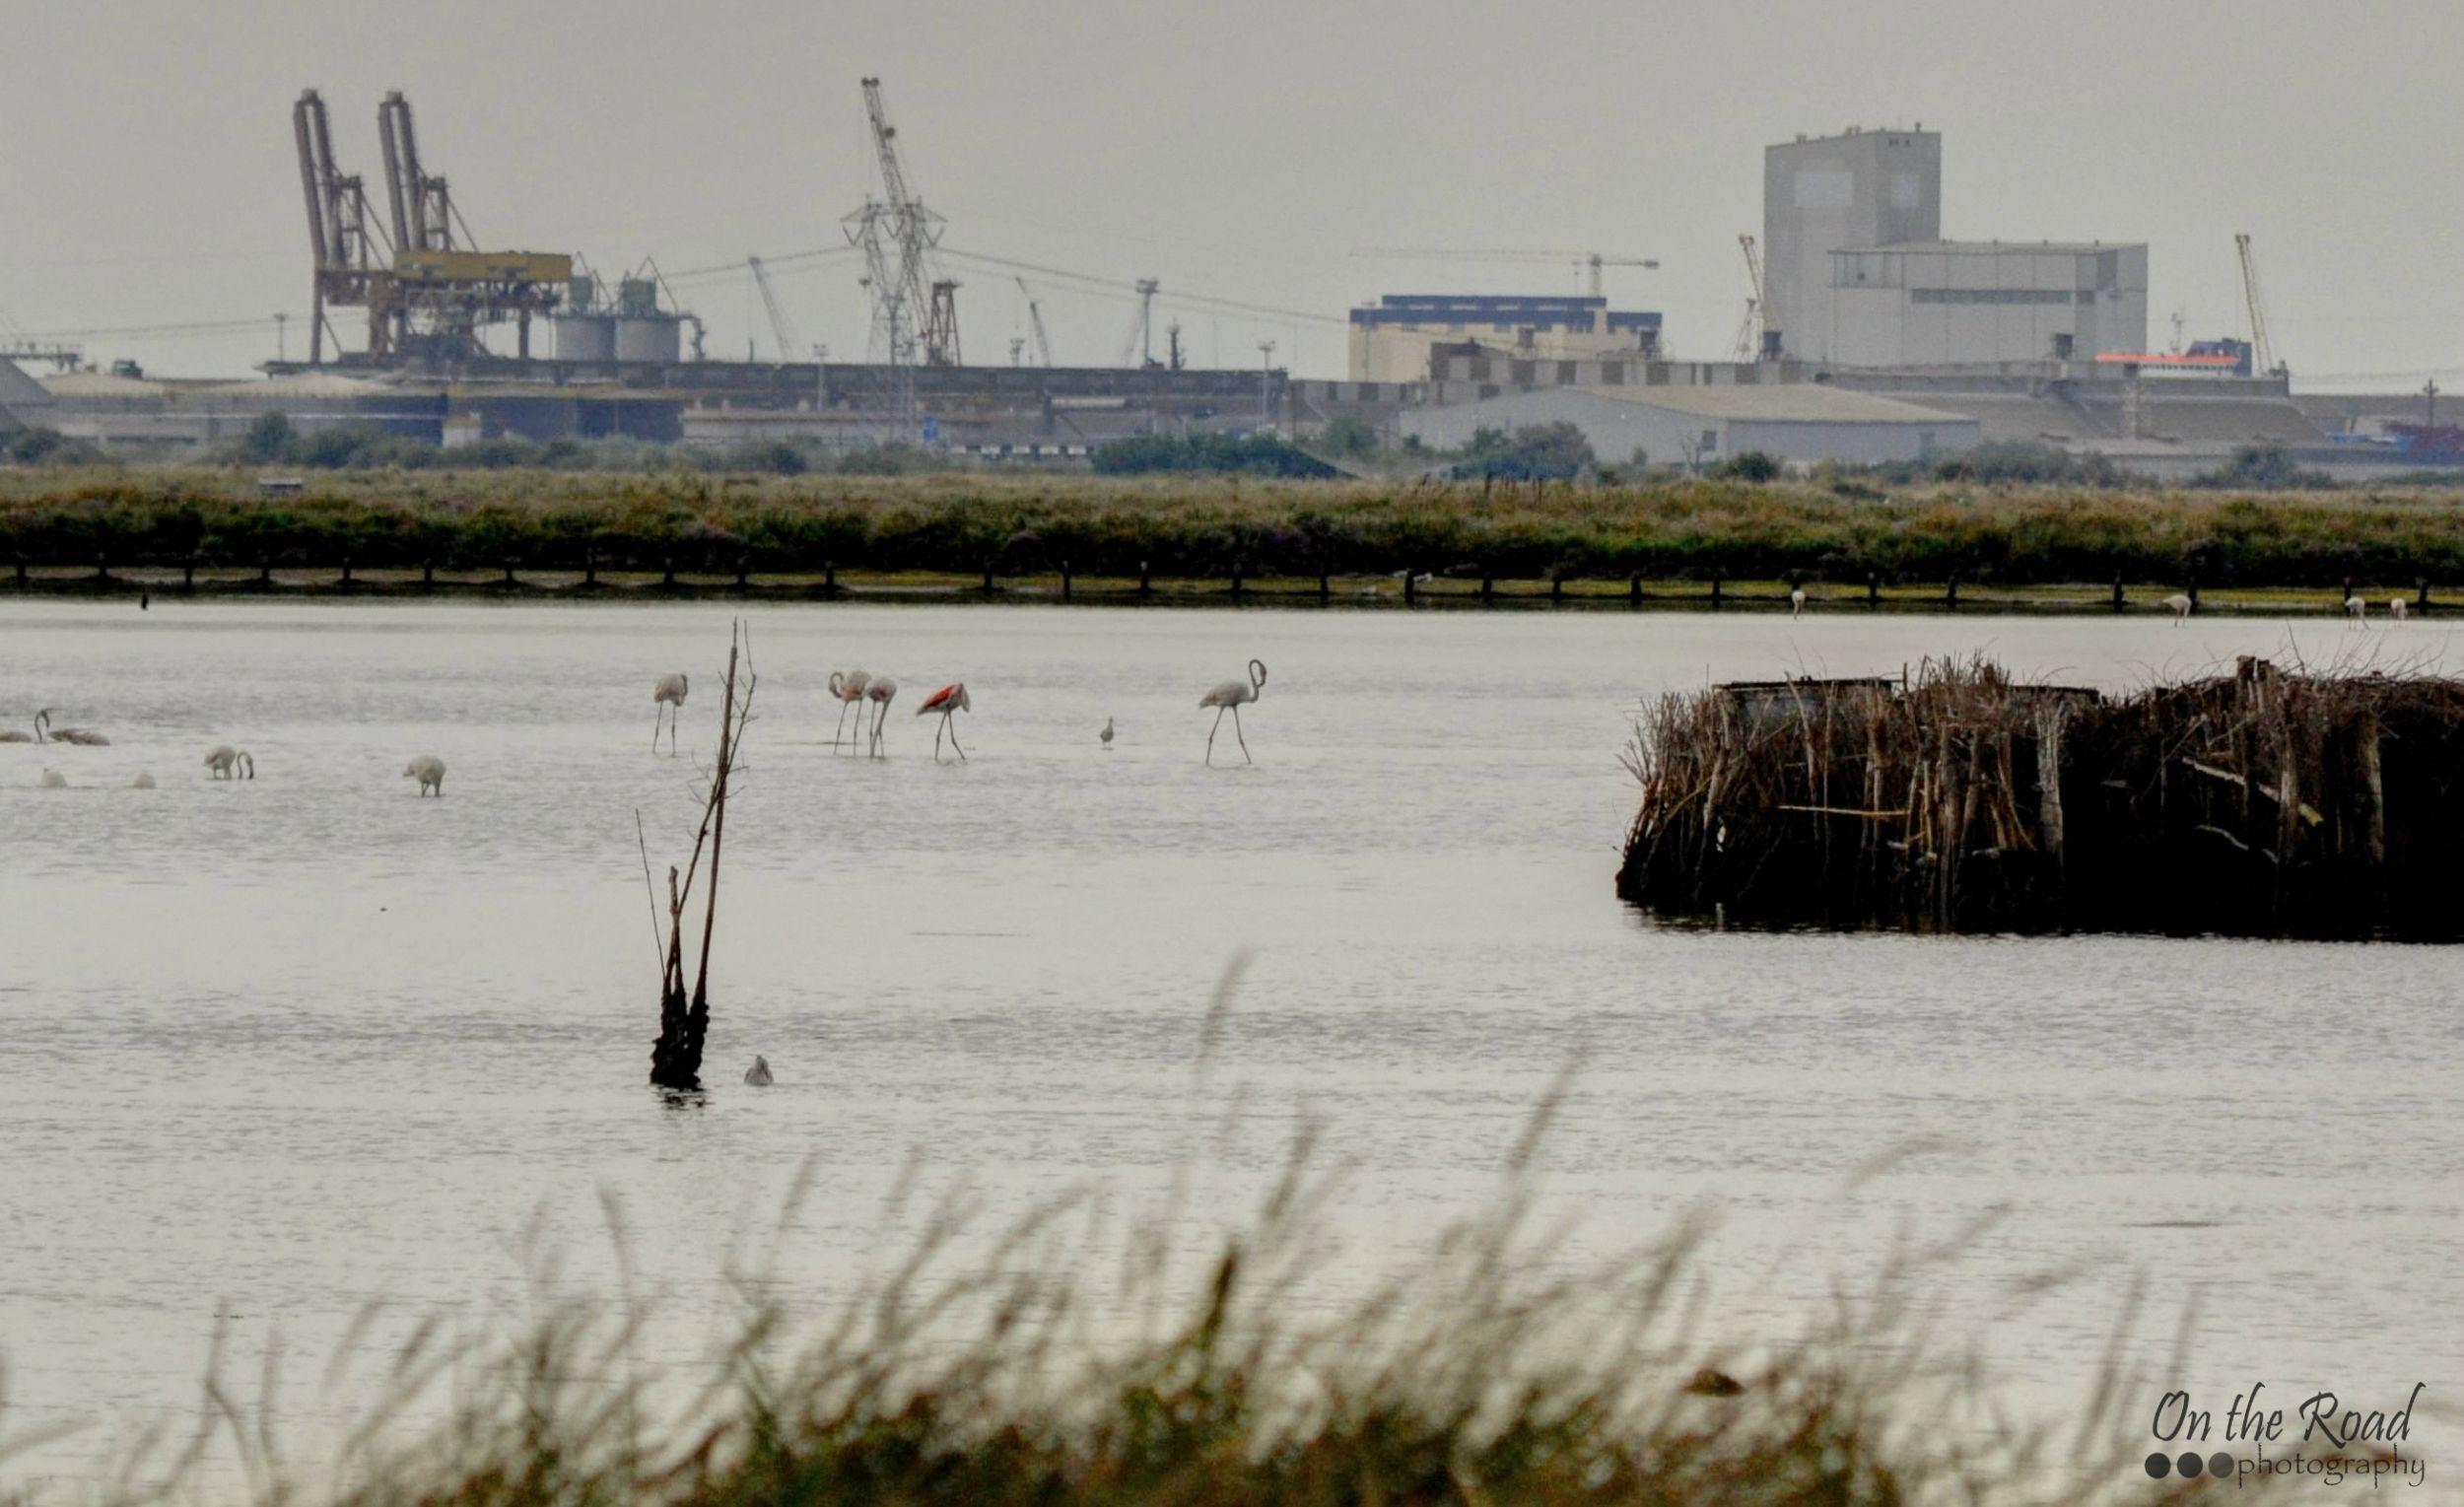 Flamingos in the wild at Marina di Ravenna